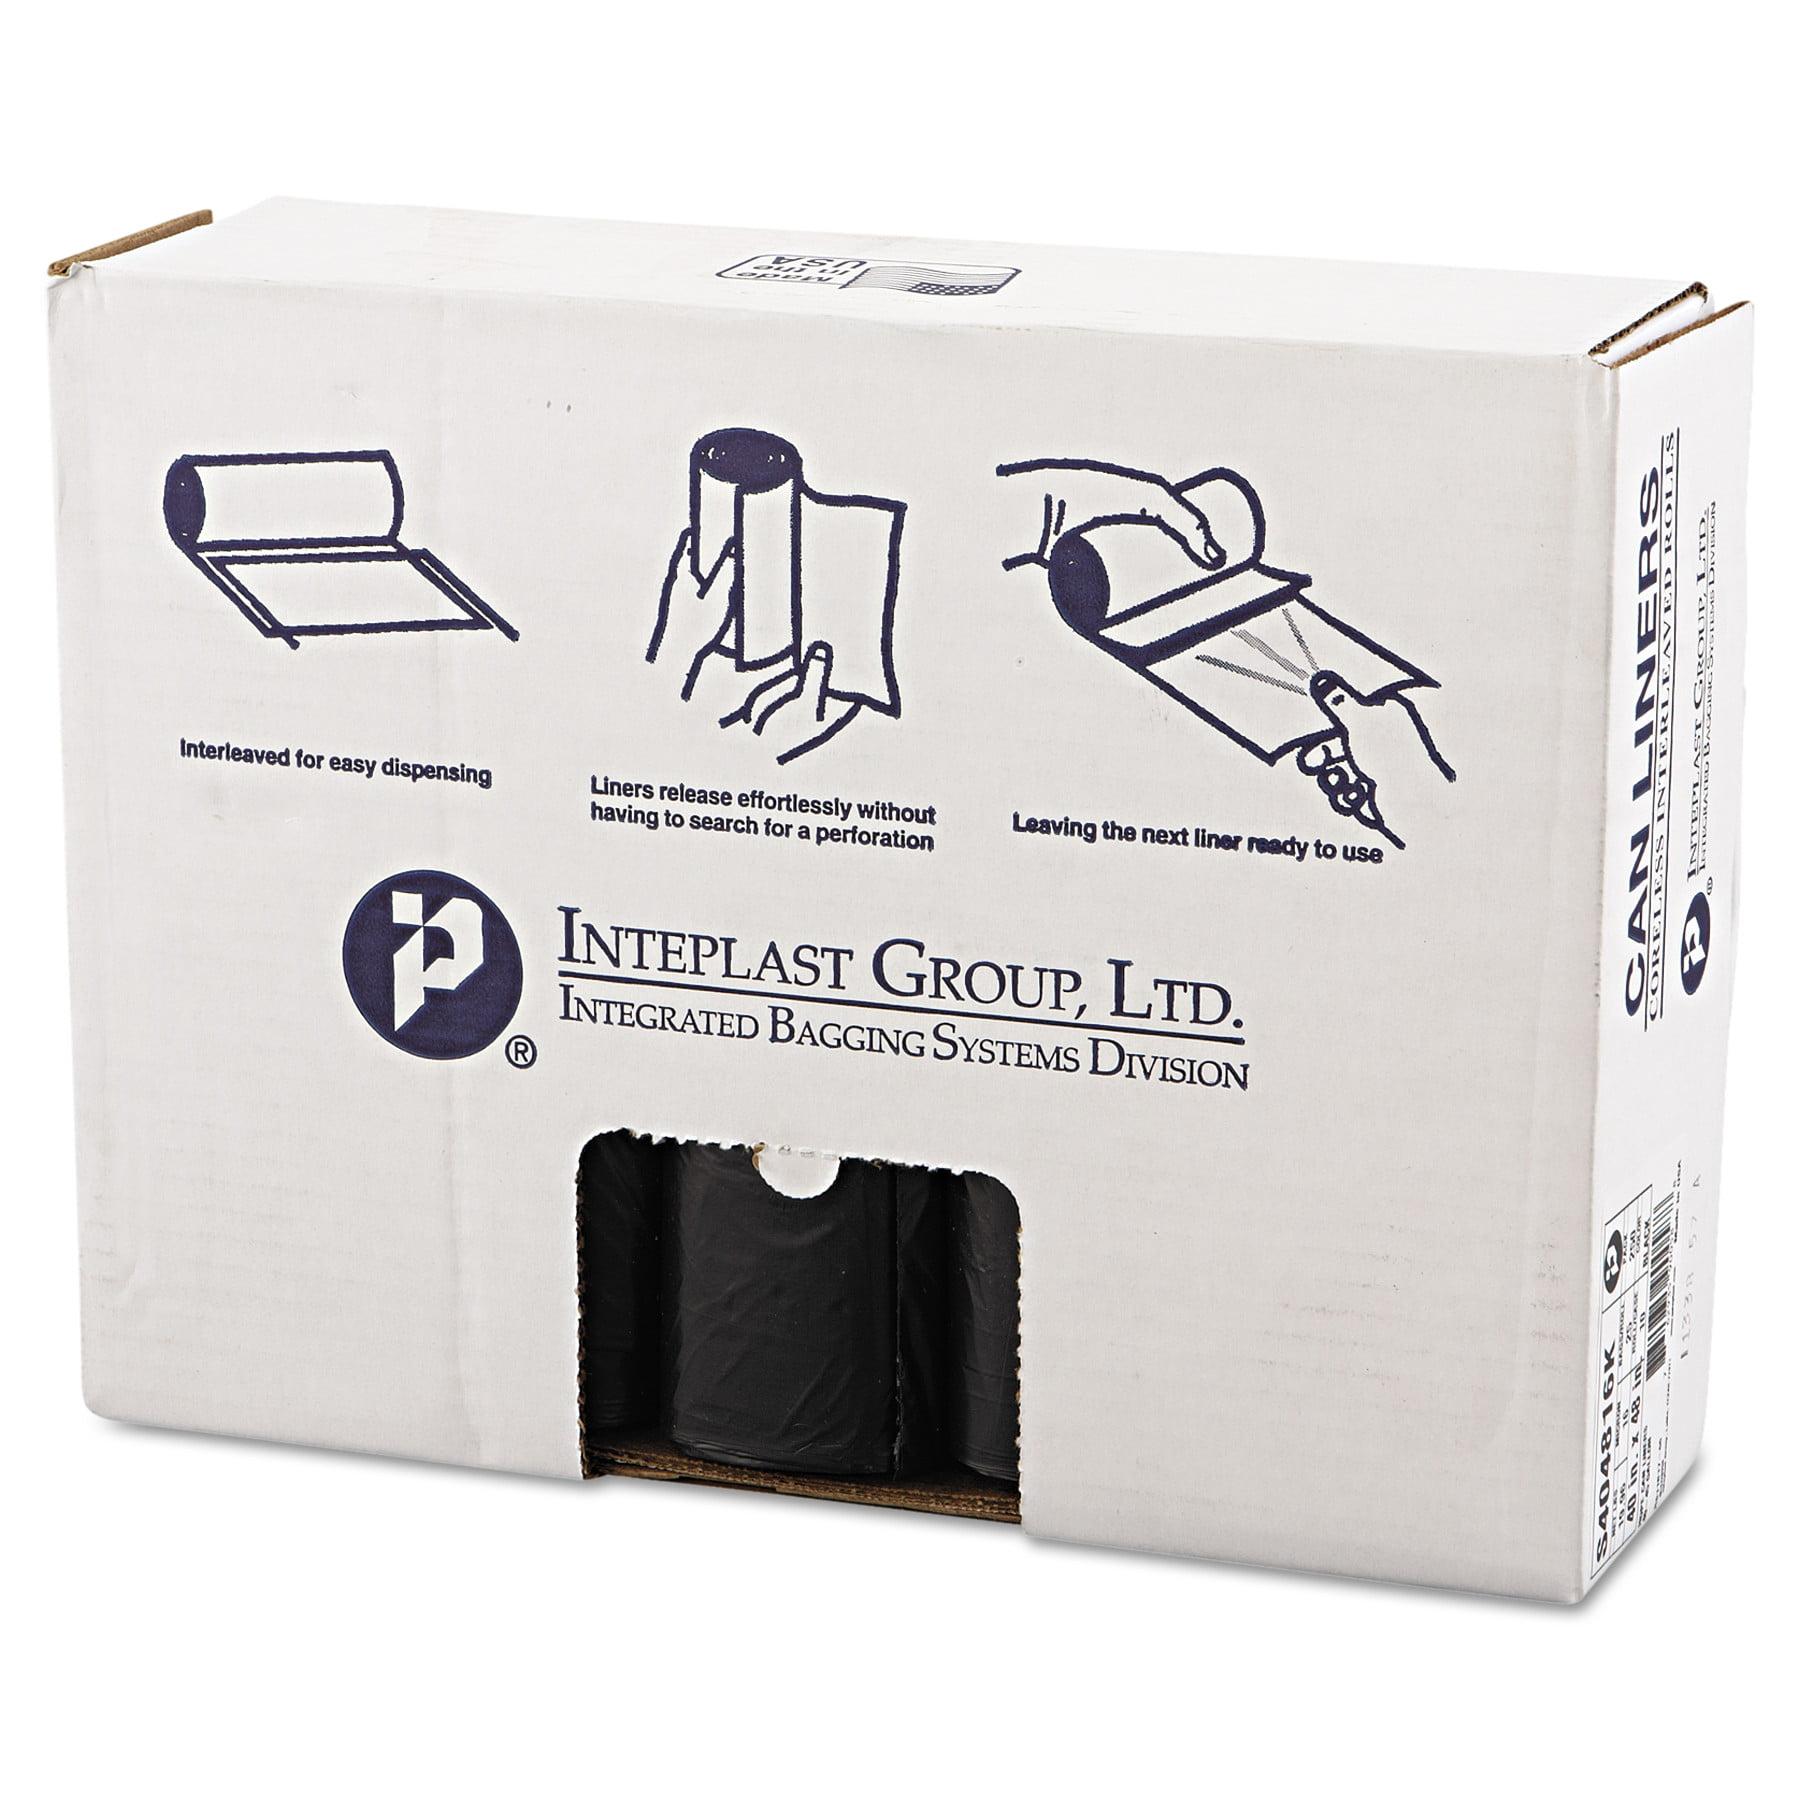 Inteplast Group High-Density Trash Bag, 40 x 48, 45gal, 16mic, Black, 25/Roll, 10 Rolls/Carton